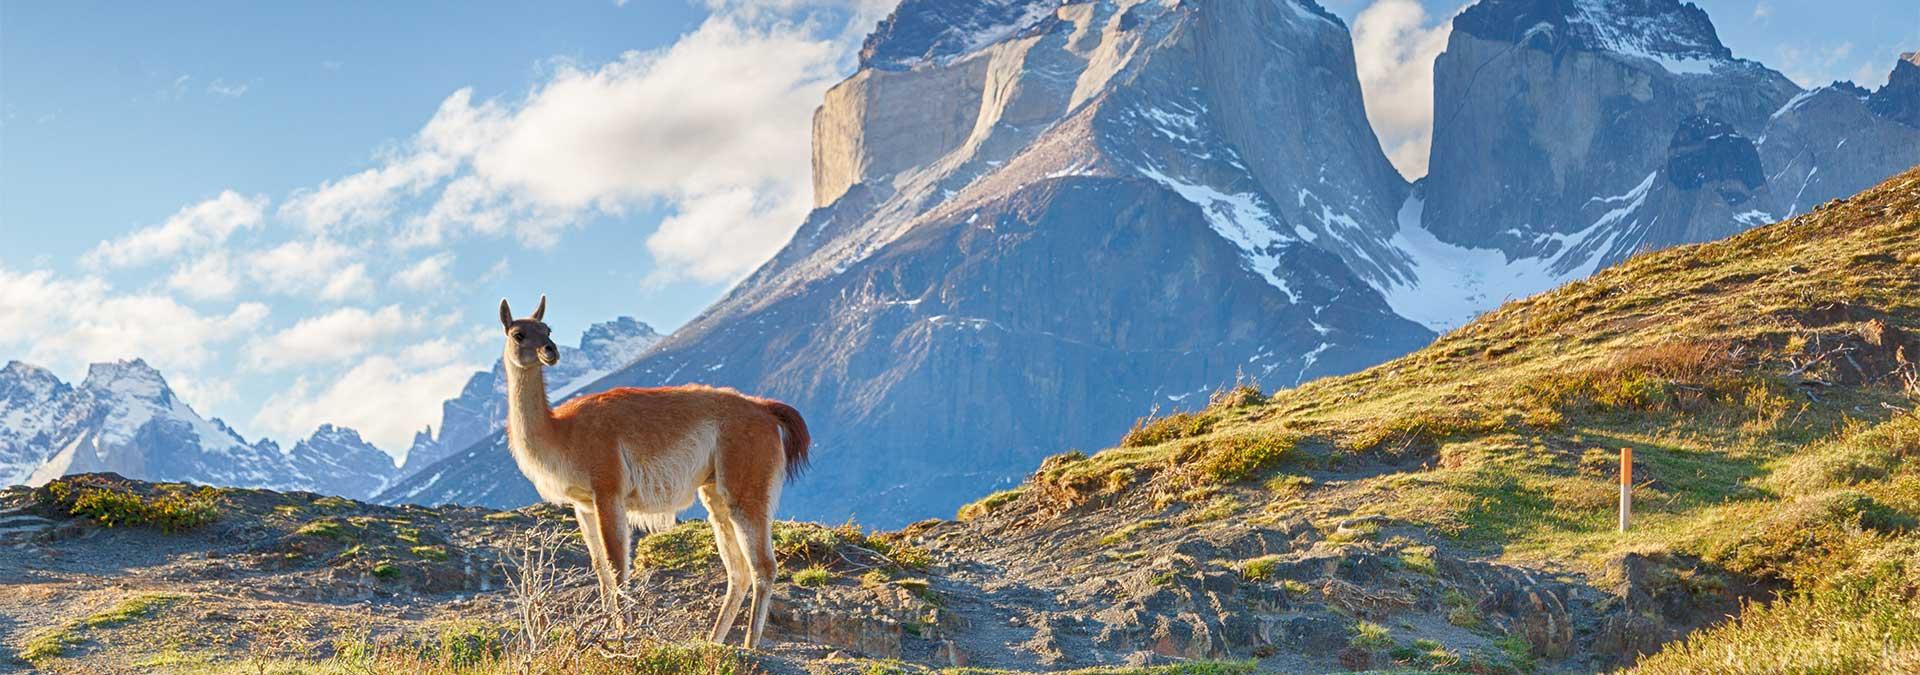 Patagonia mountain range